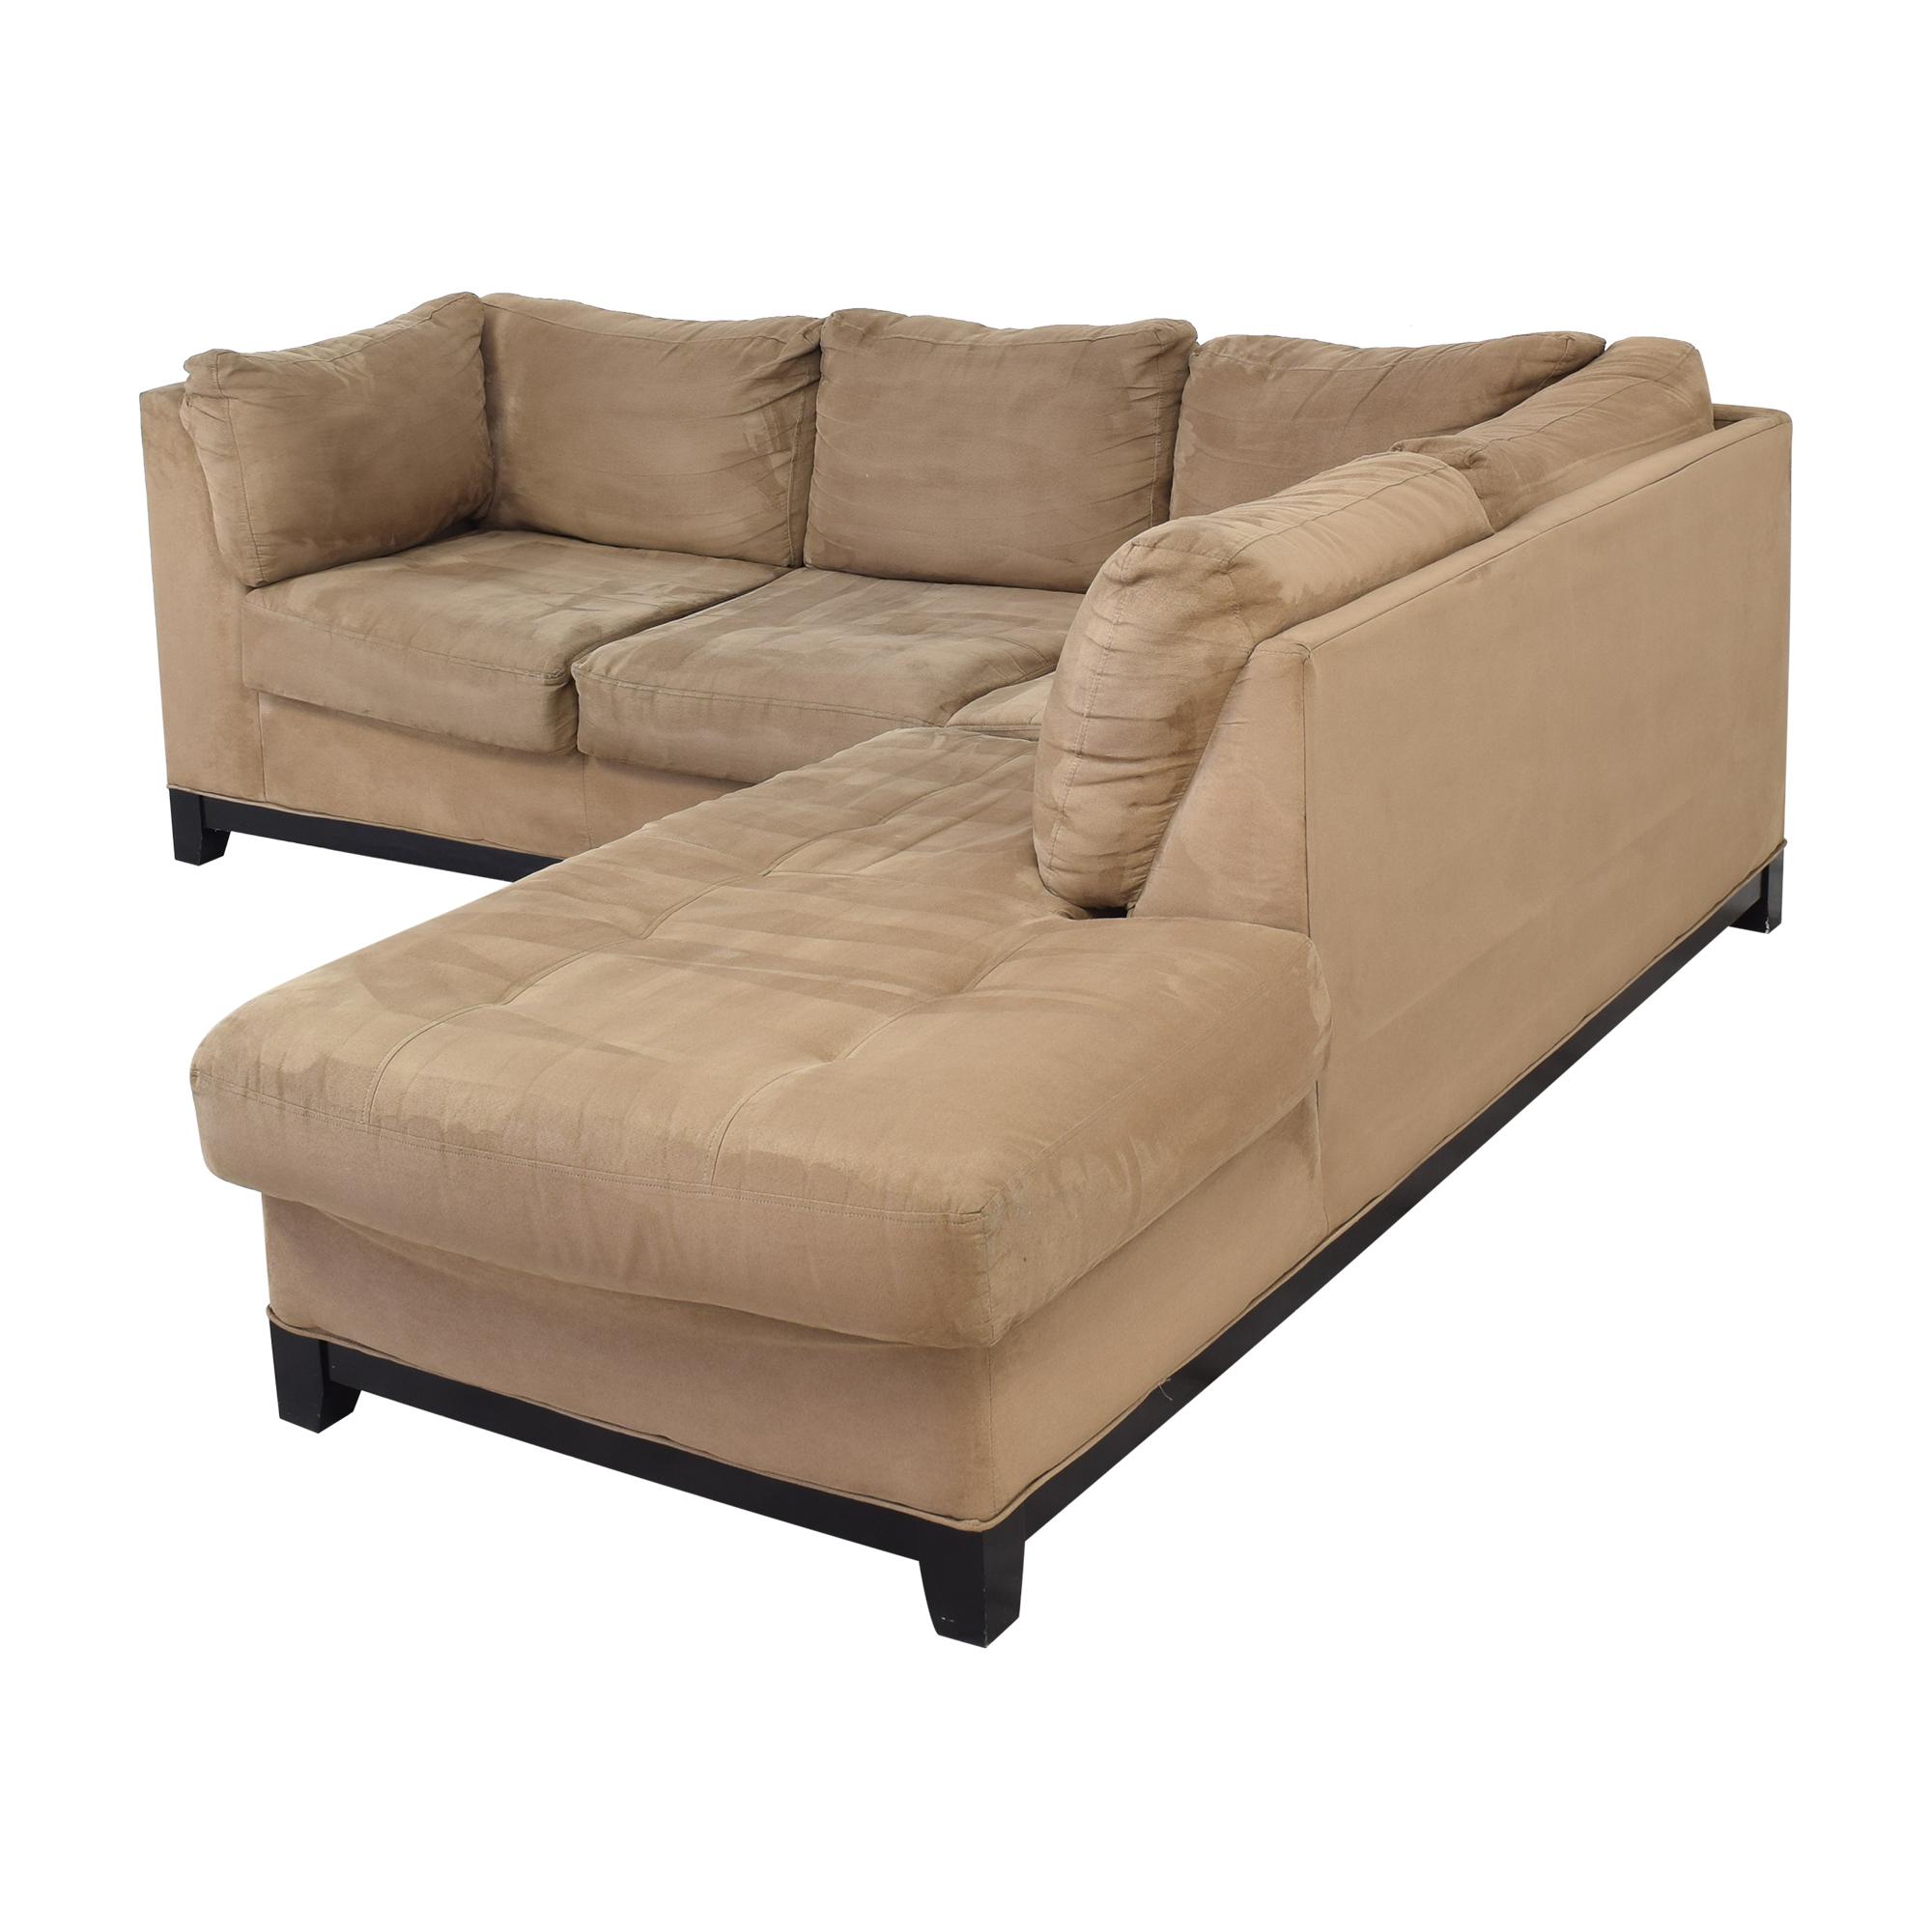 Raymour & Flanigan Raymour & Flanigan Kathy Ireland Chaise Sectional Sofa on sale